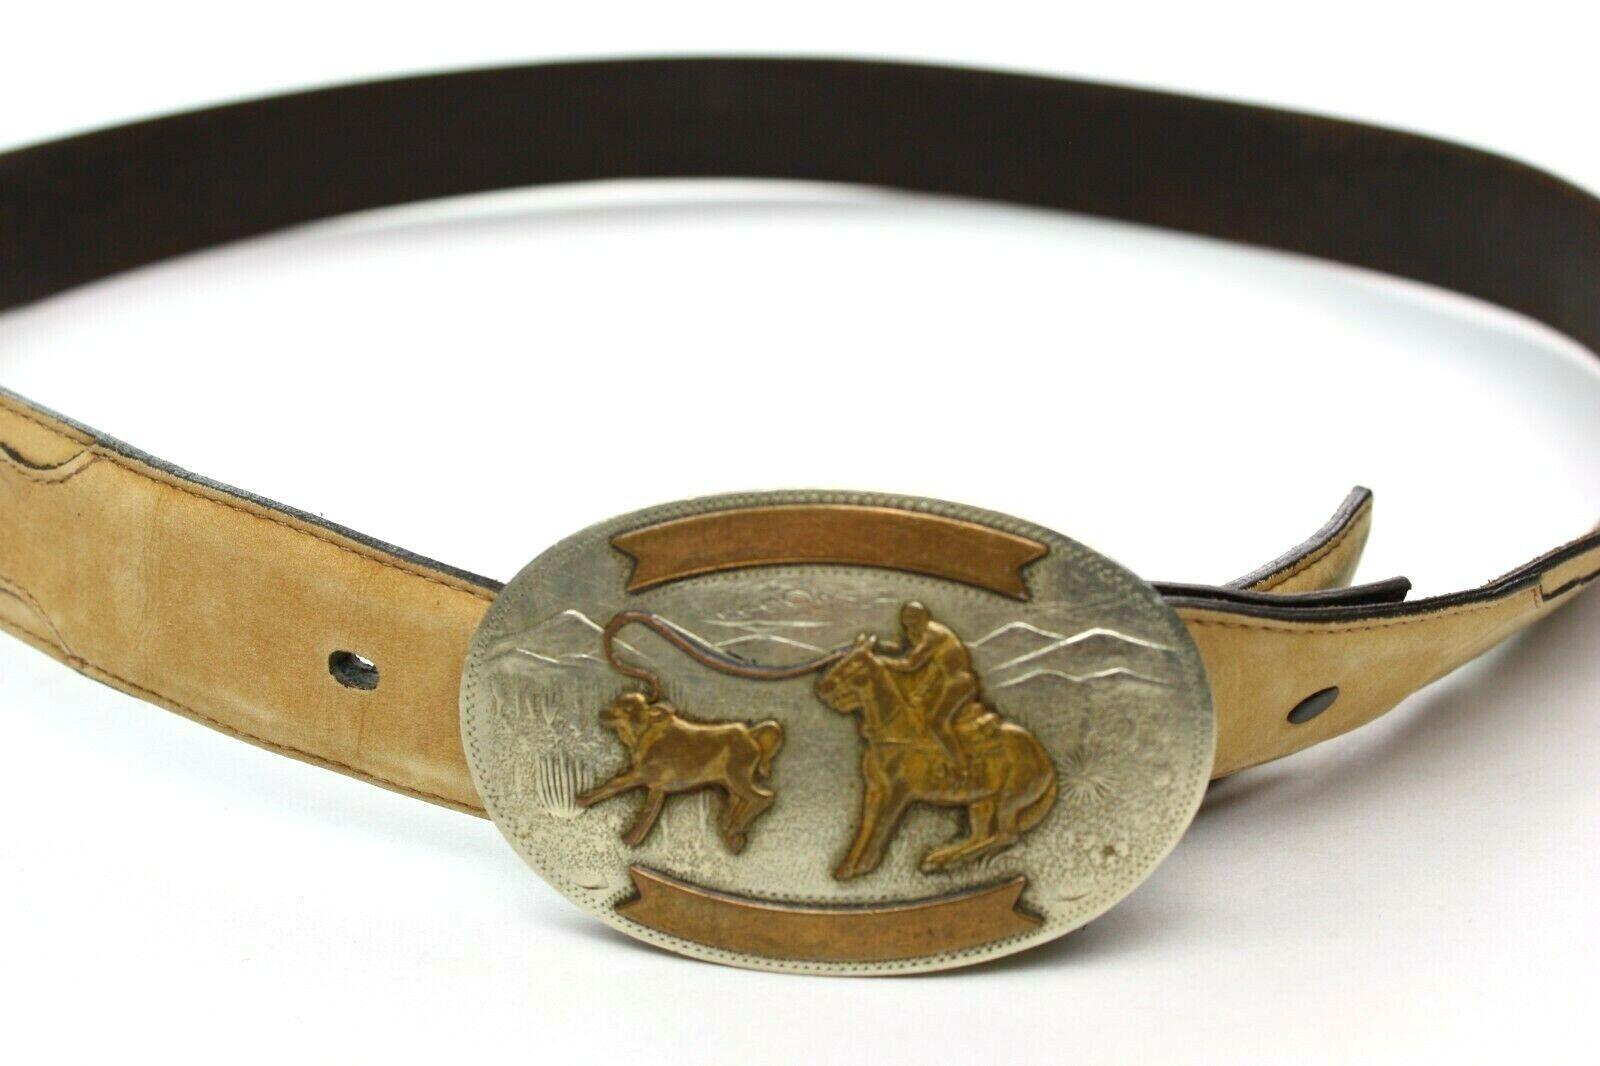 Comstock German Silver Belt Buckle Calf Roping Rodeo w/ Genuine Leather Belt